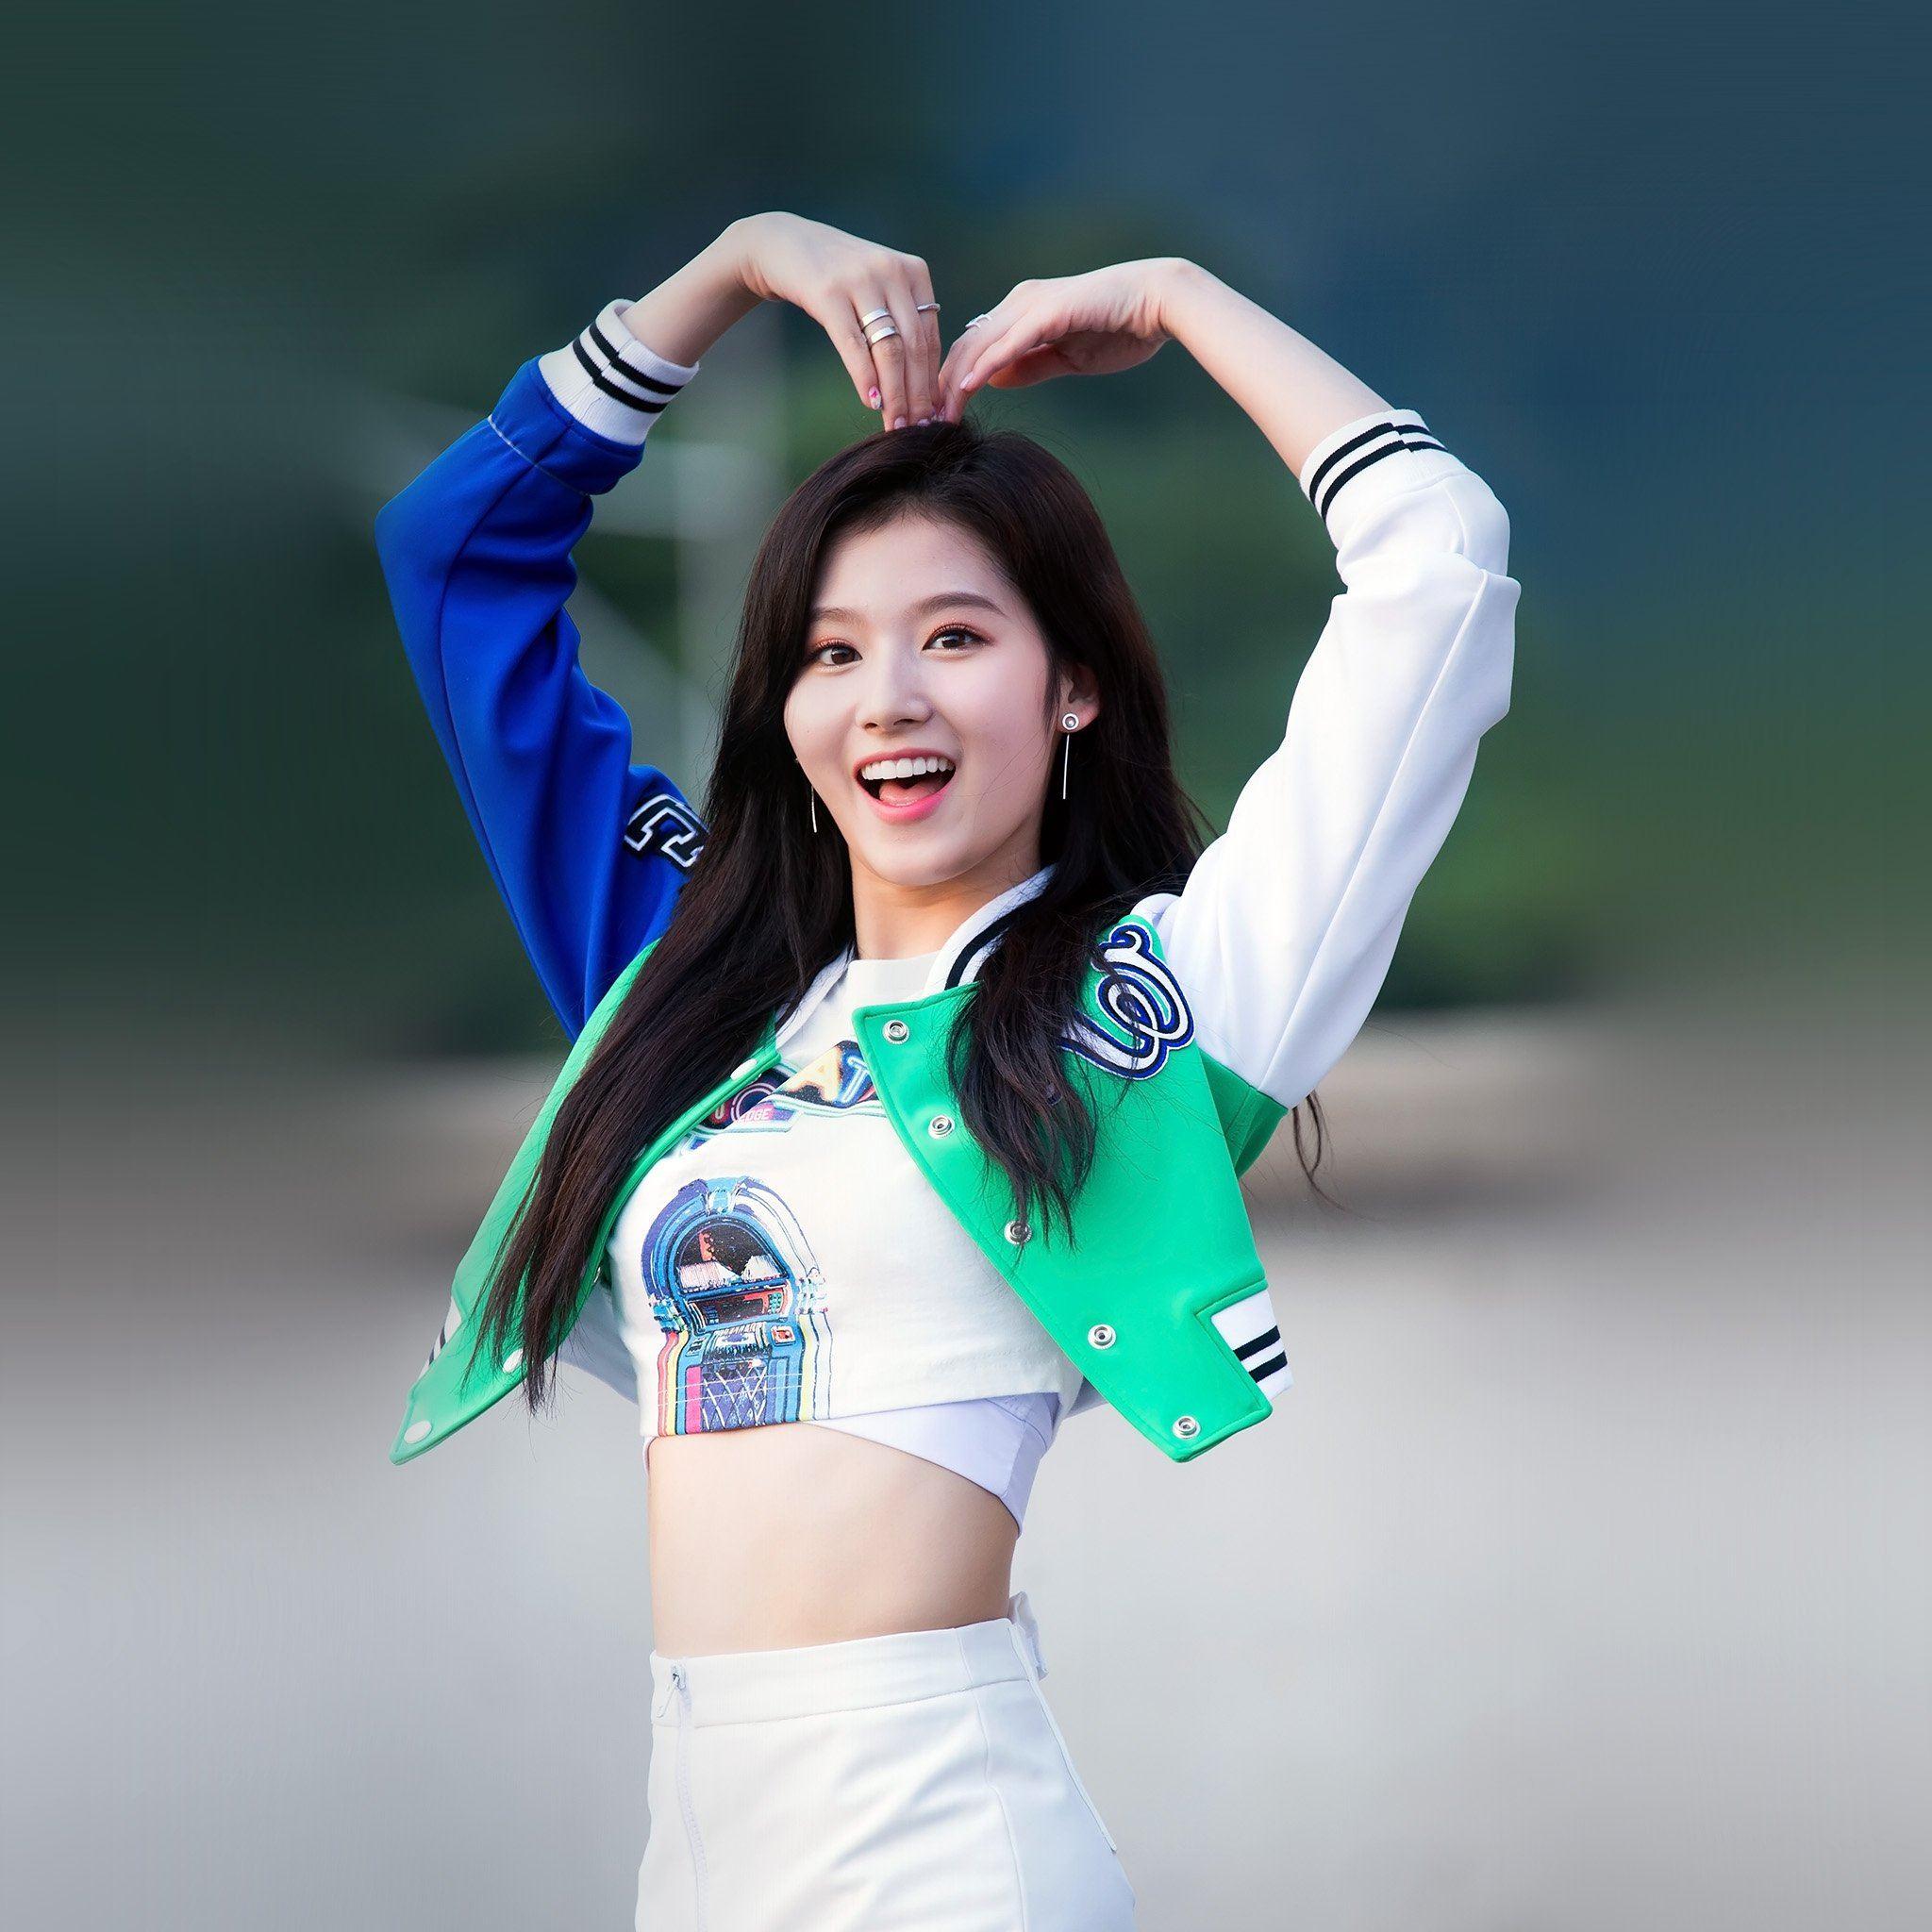 Kpop Sana Heart Love Cute Girl Celebrity Ipad Air Wallpapers